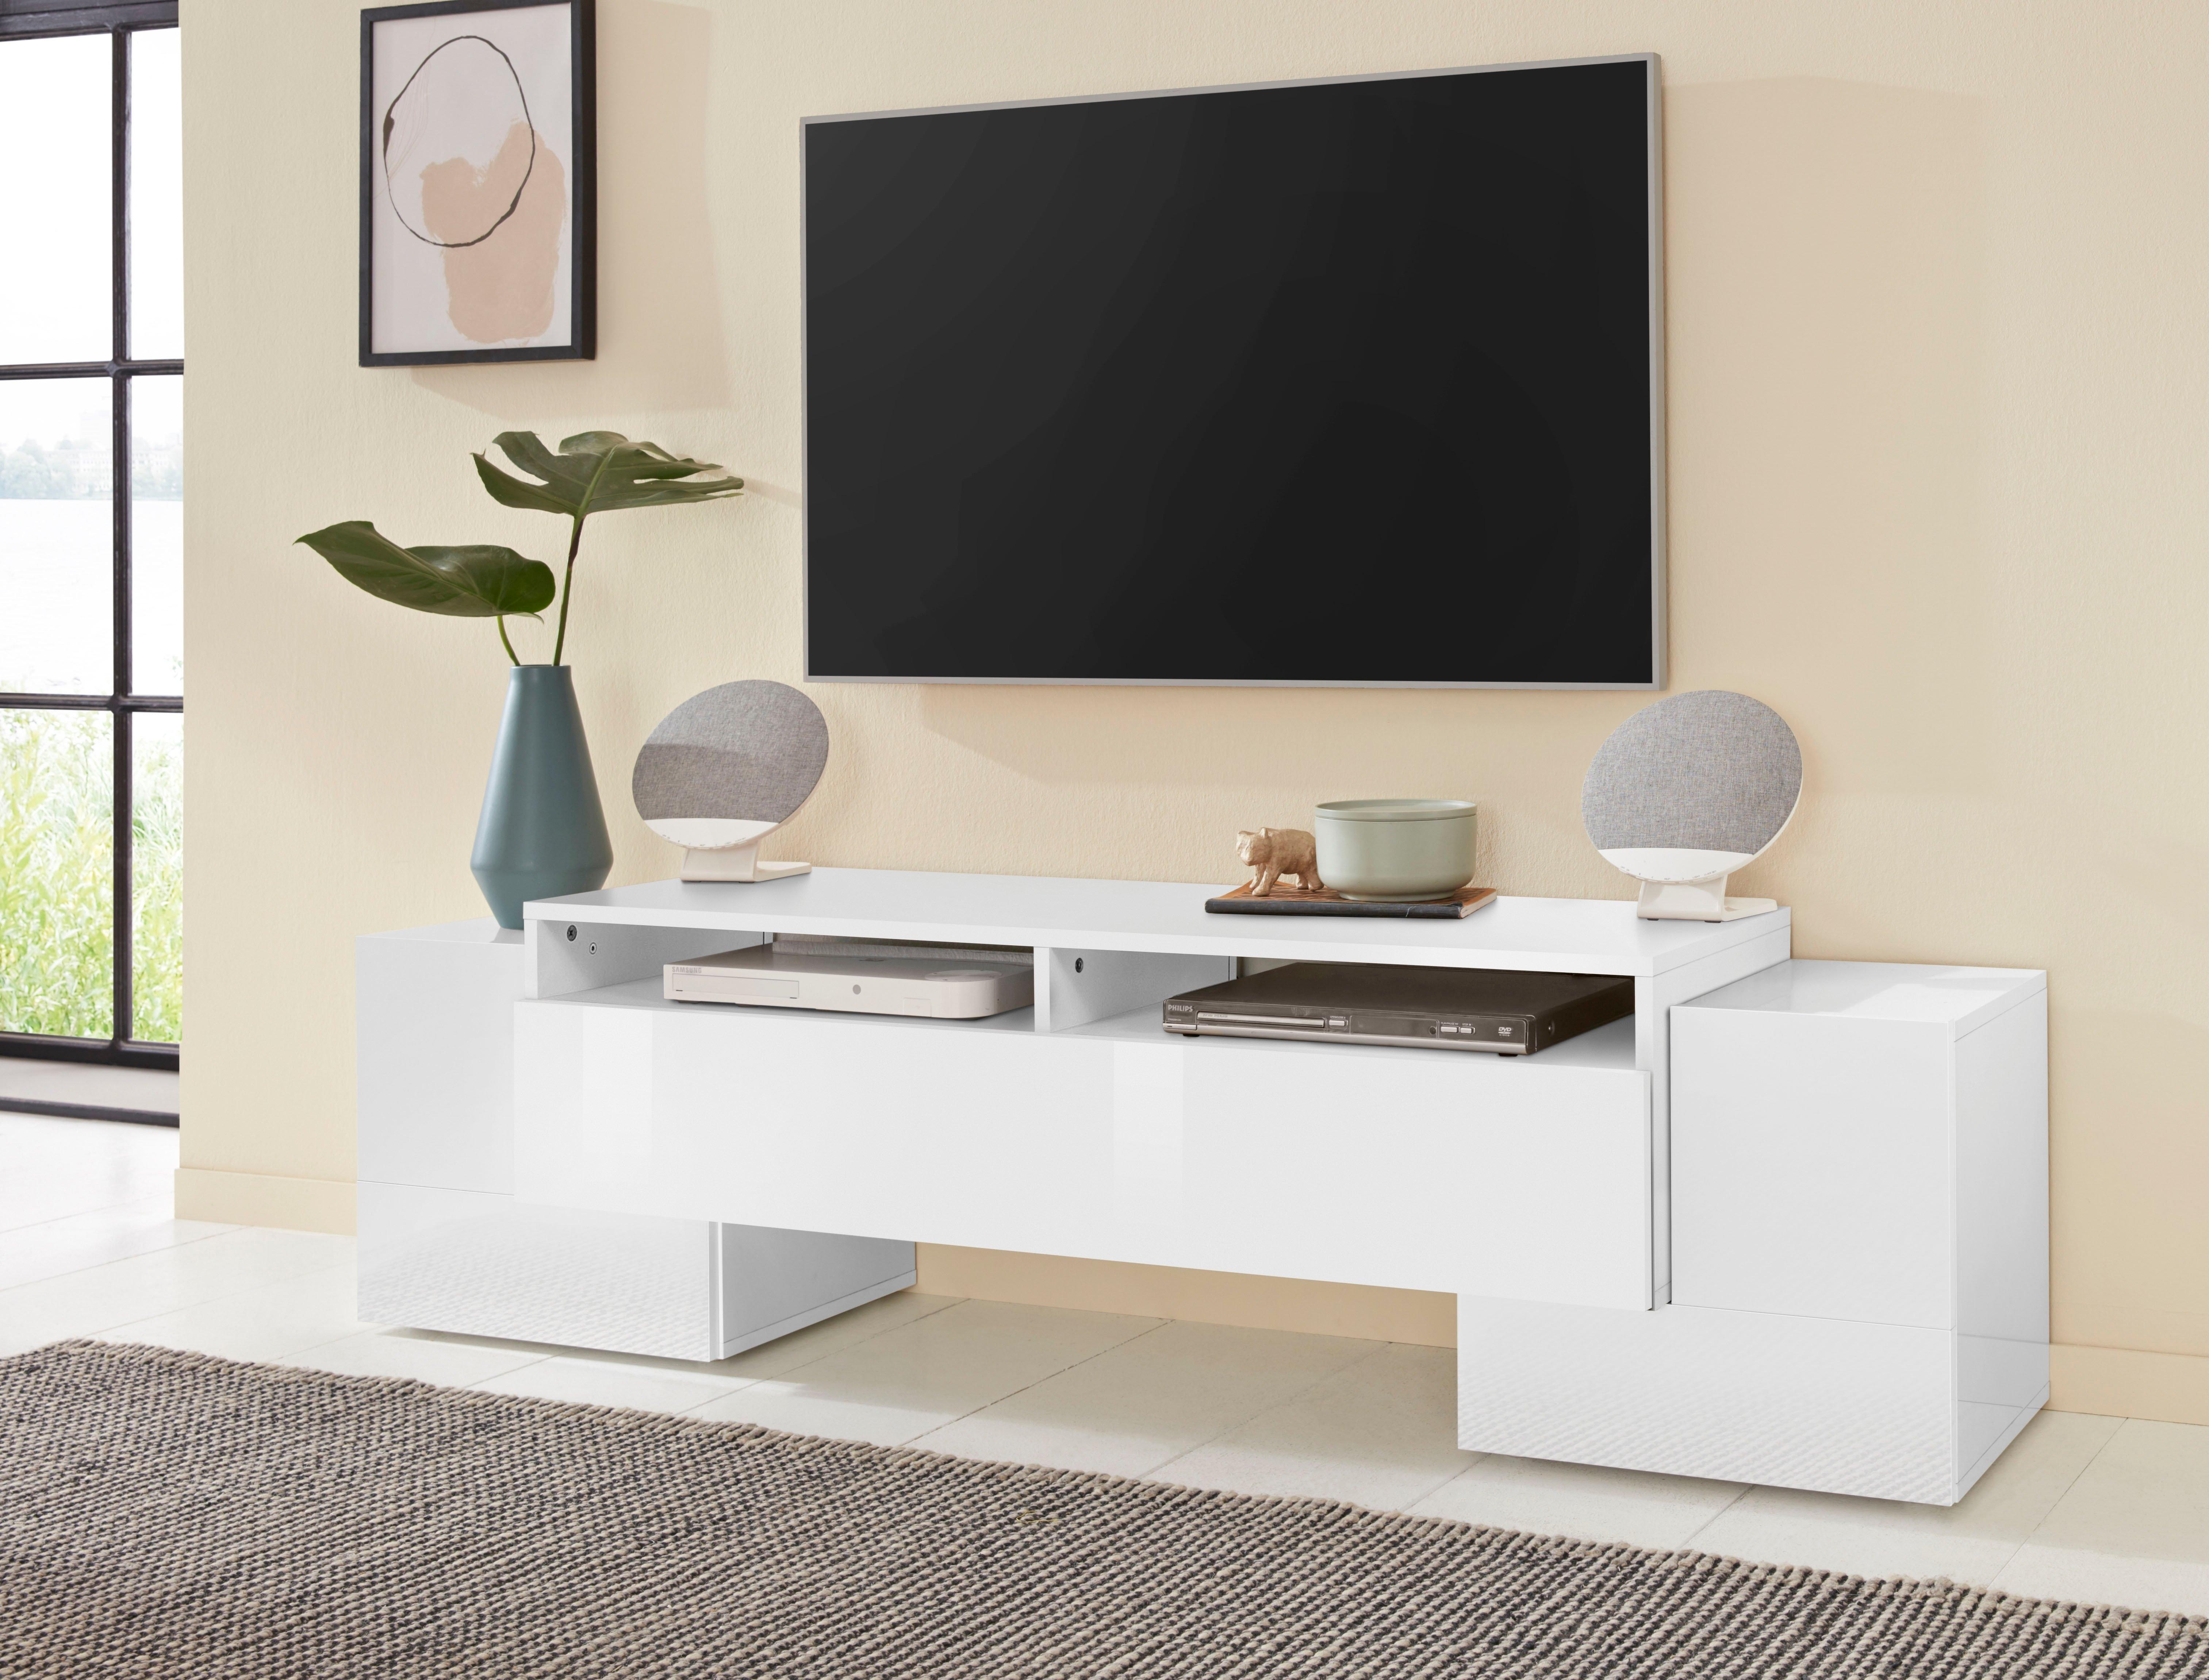 Tecnos tv-meubel Pillon Breedte 170 cm online kopen op otto.nl